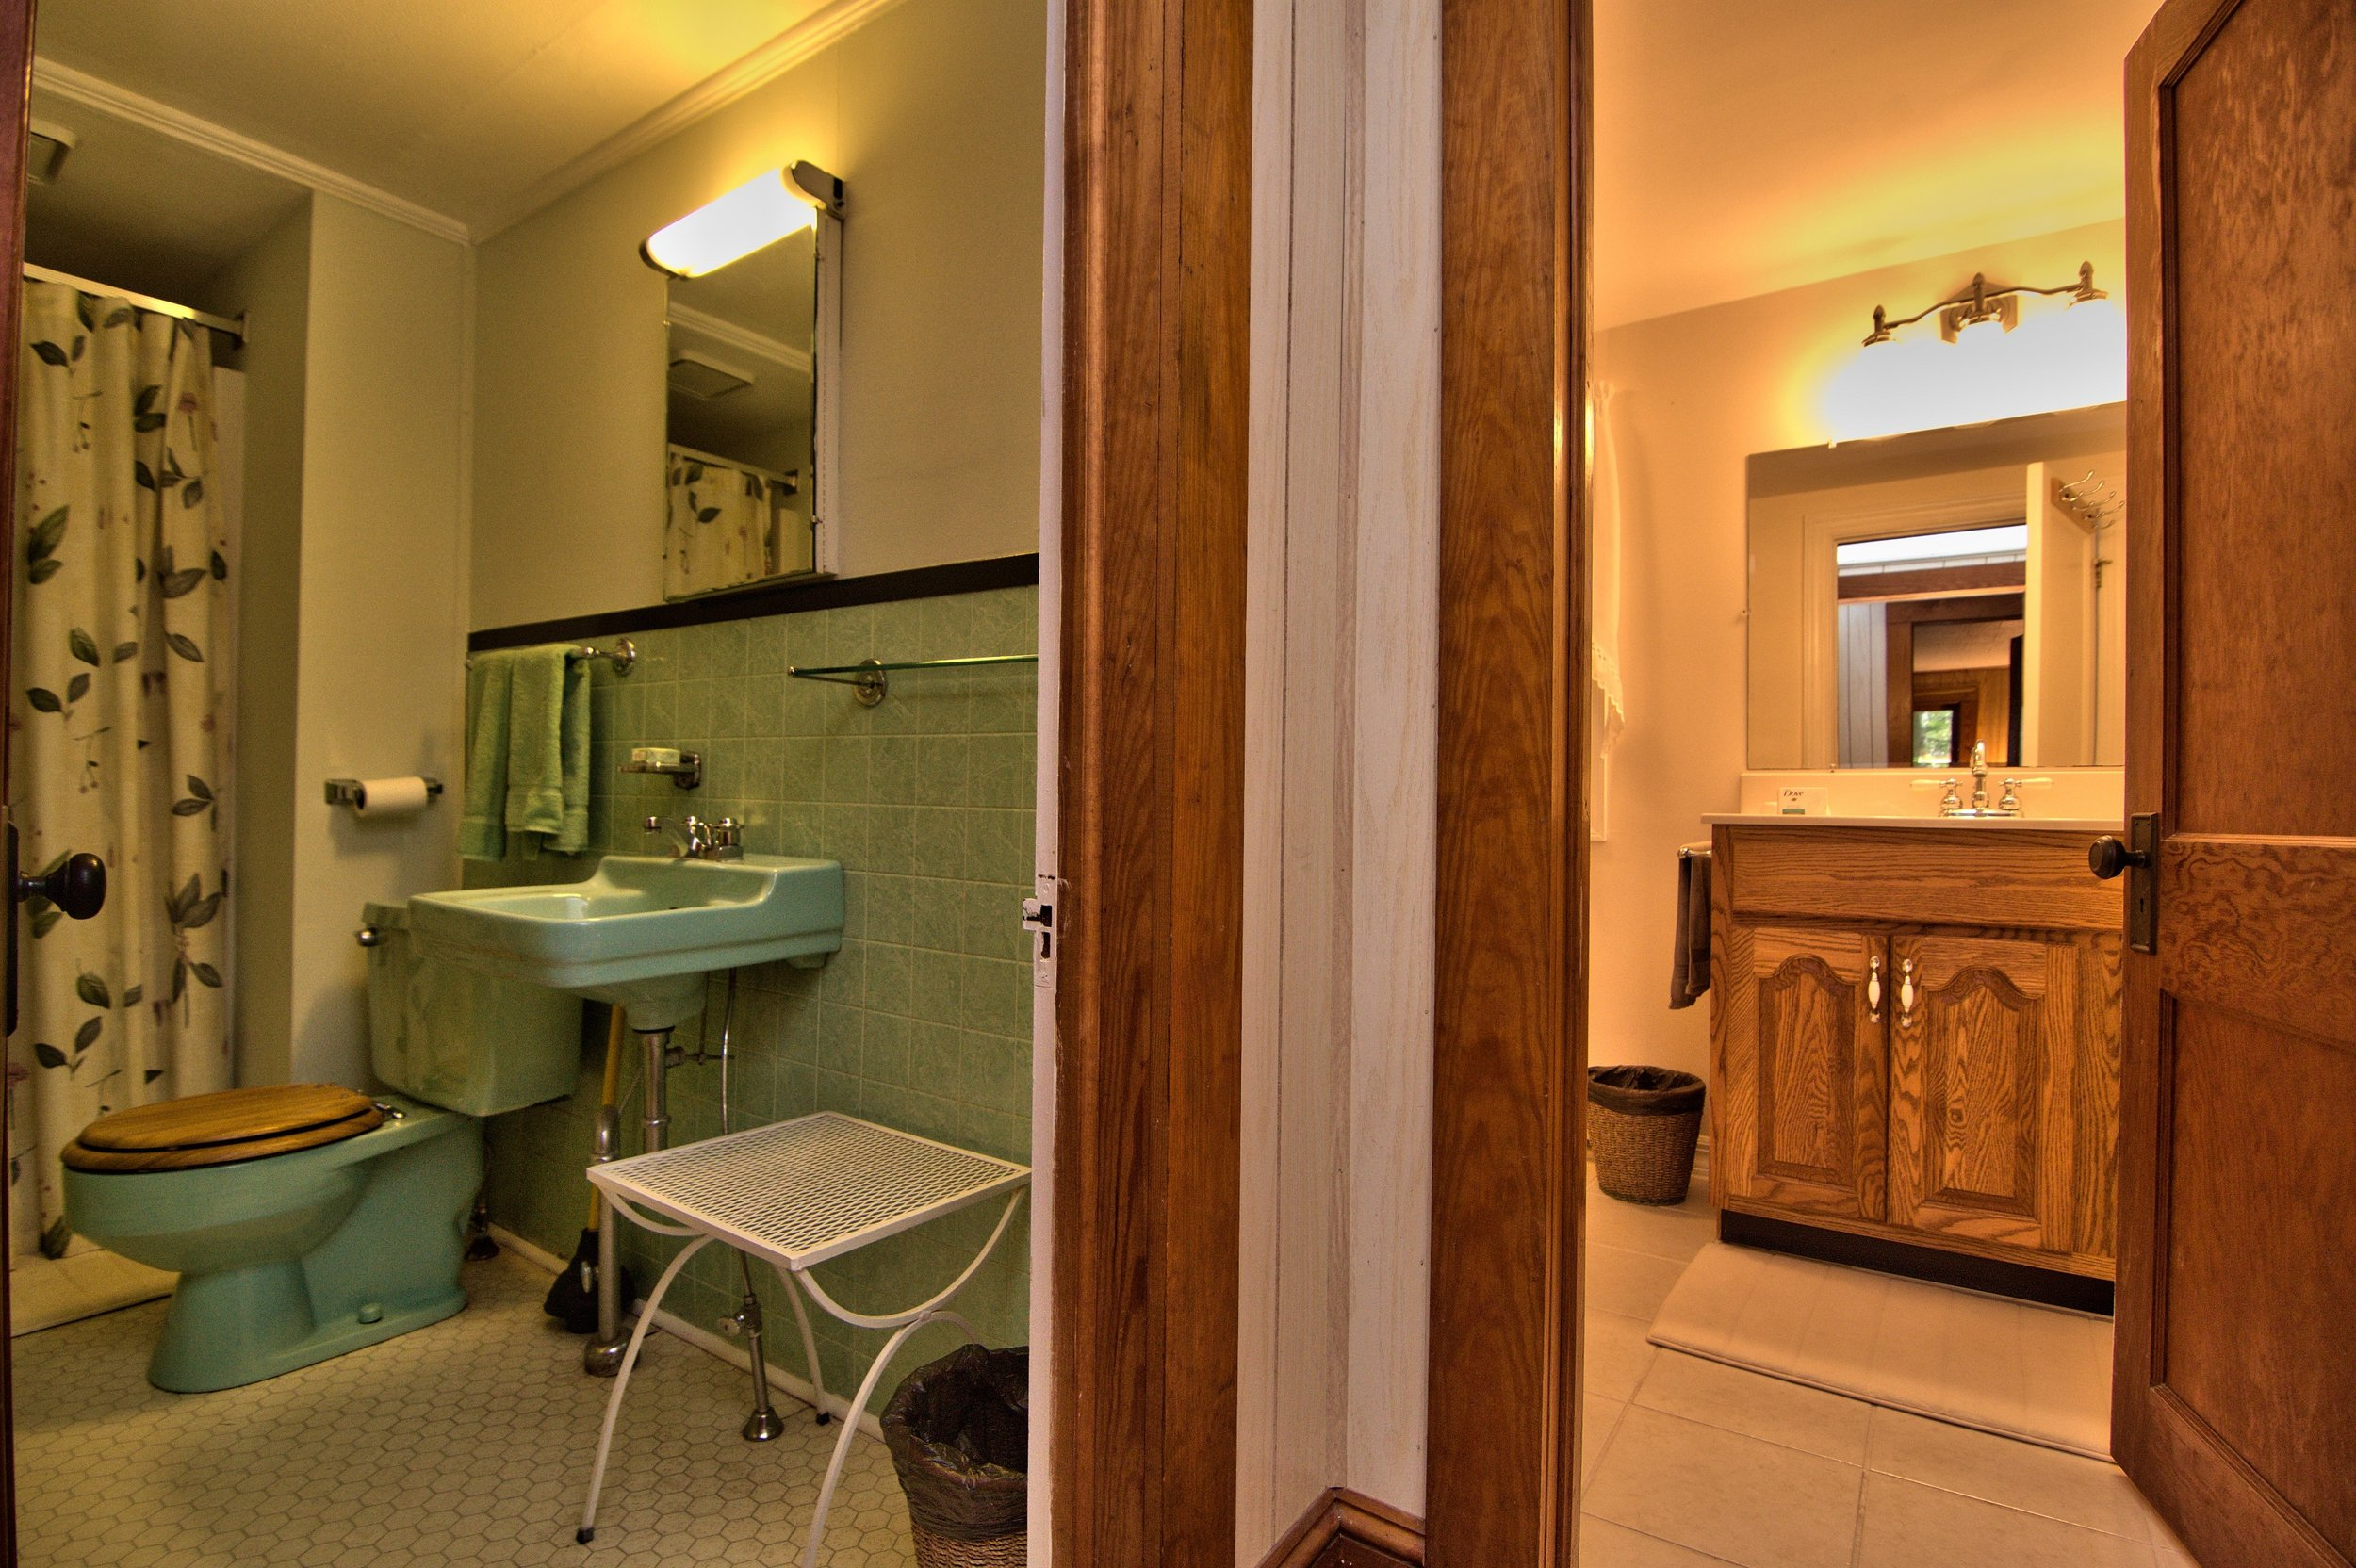 Hall Bath 1 View 1.jpg